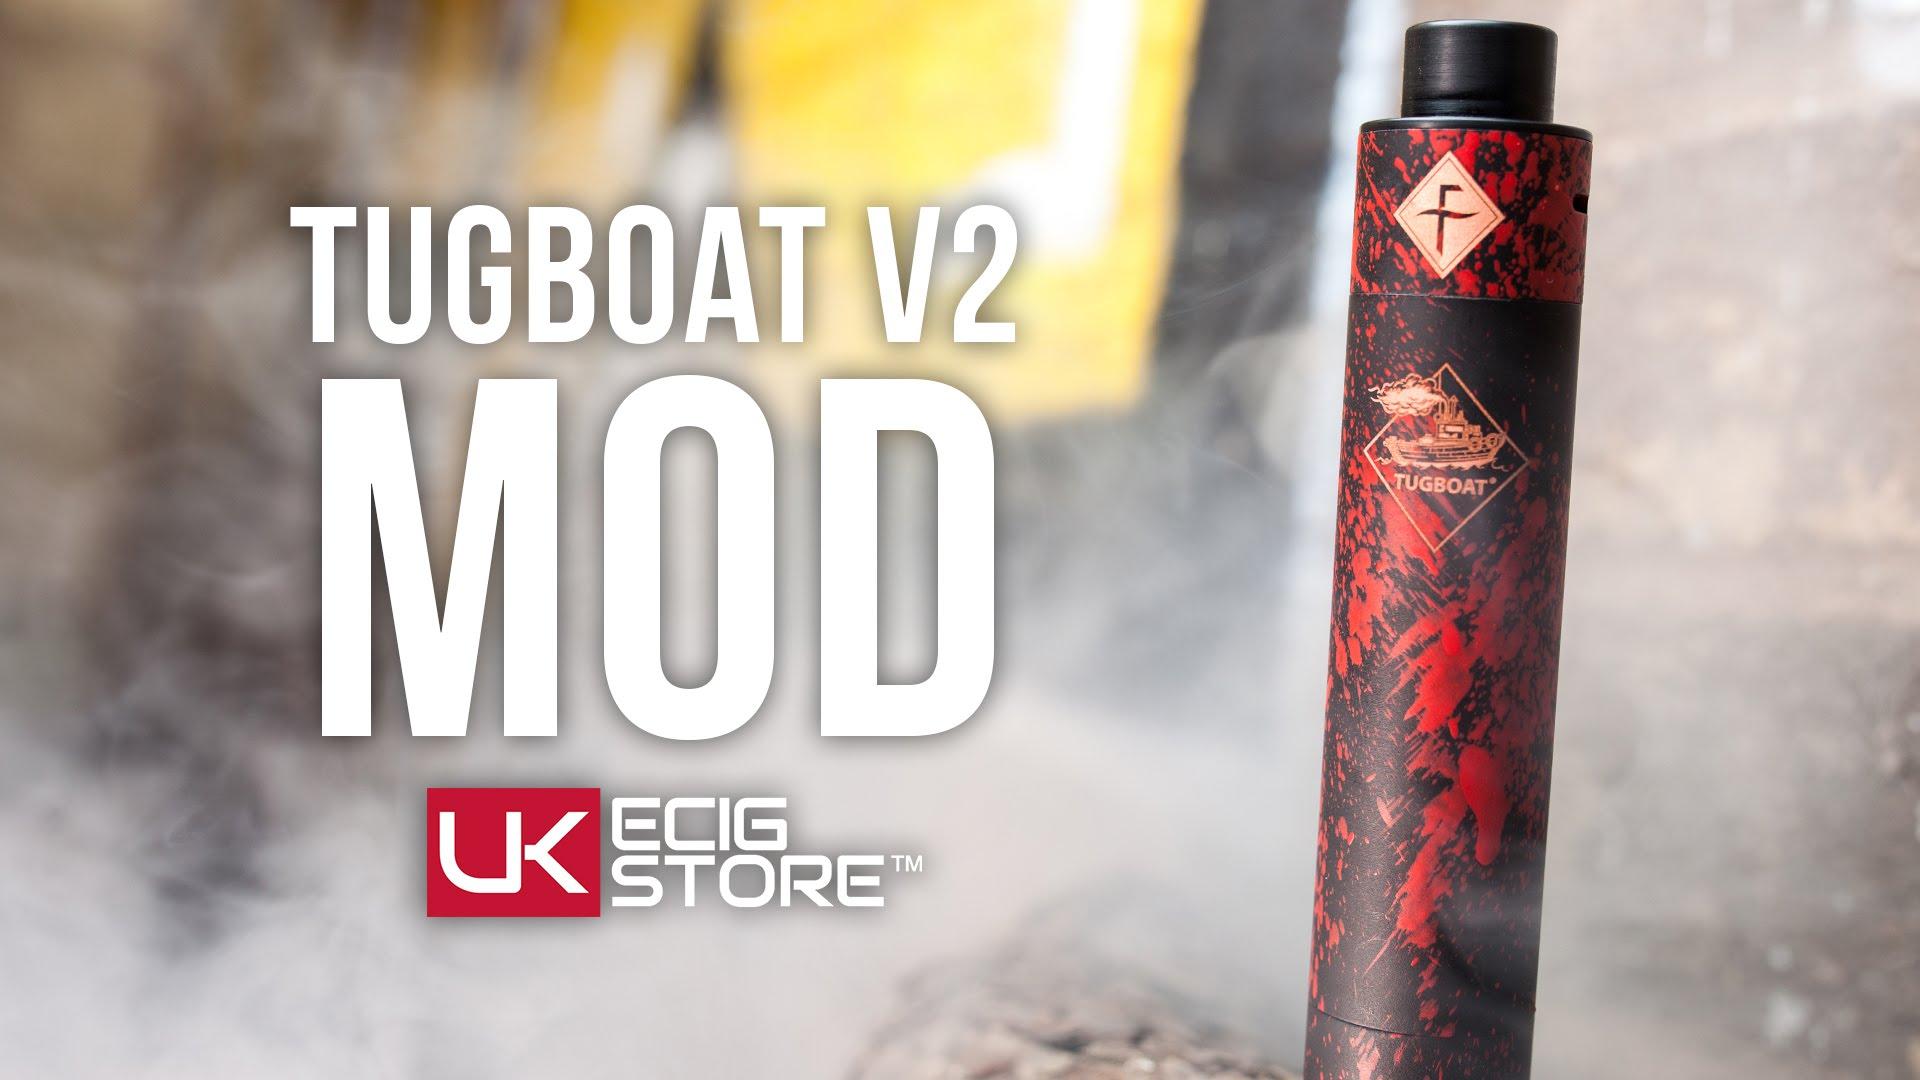 Tugboat Mod V2 | UK ECIG STORE - YouTube